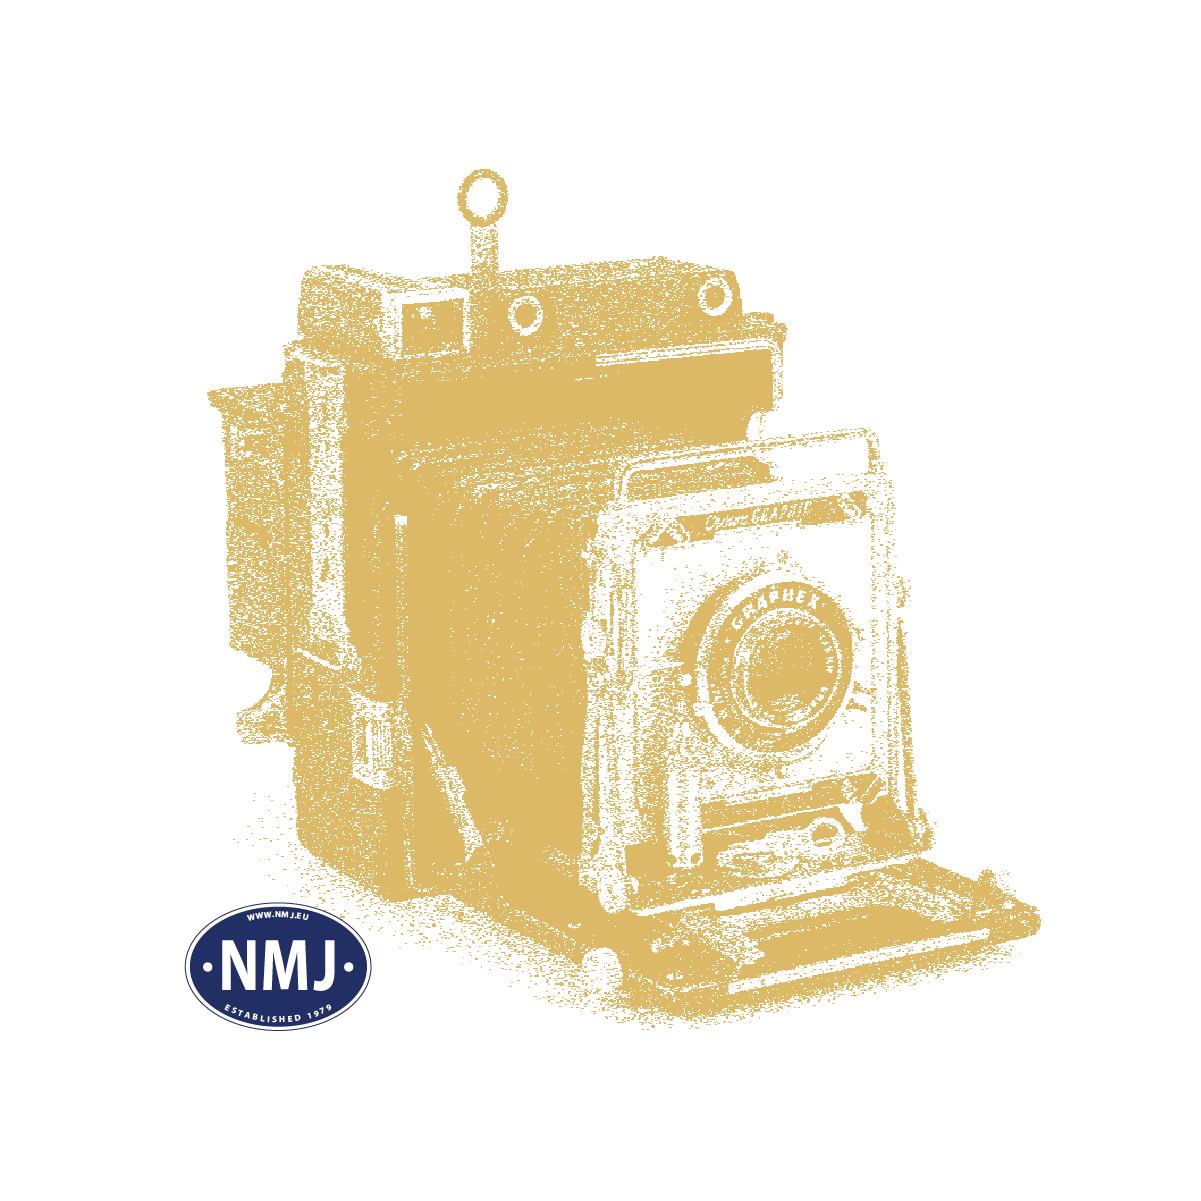 NMJT504.302 - NMJ Topline NSB His 210 2 222-7